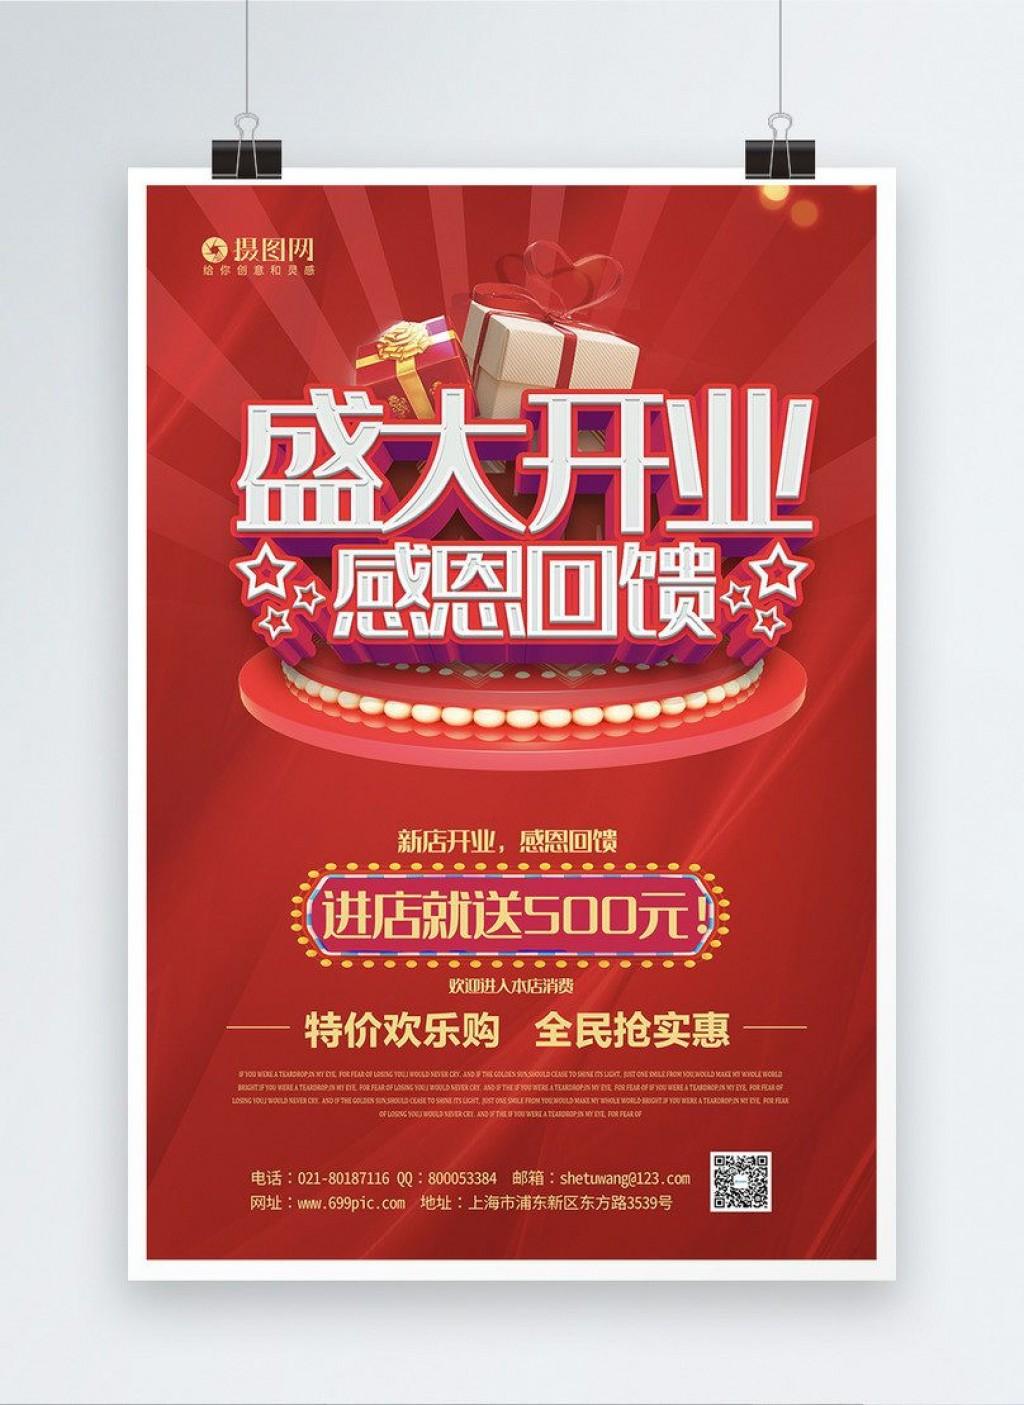 002 Phenomenal Grand Opening Flyer Template Sample  Free Psd BusinesLarge